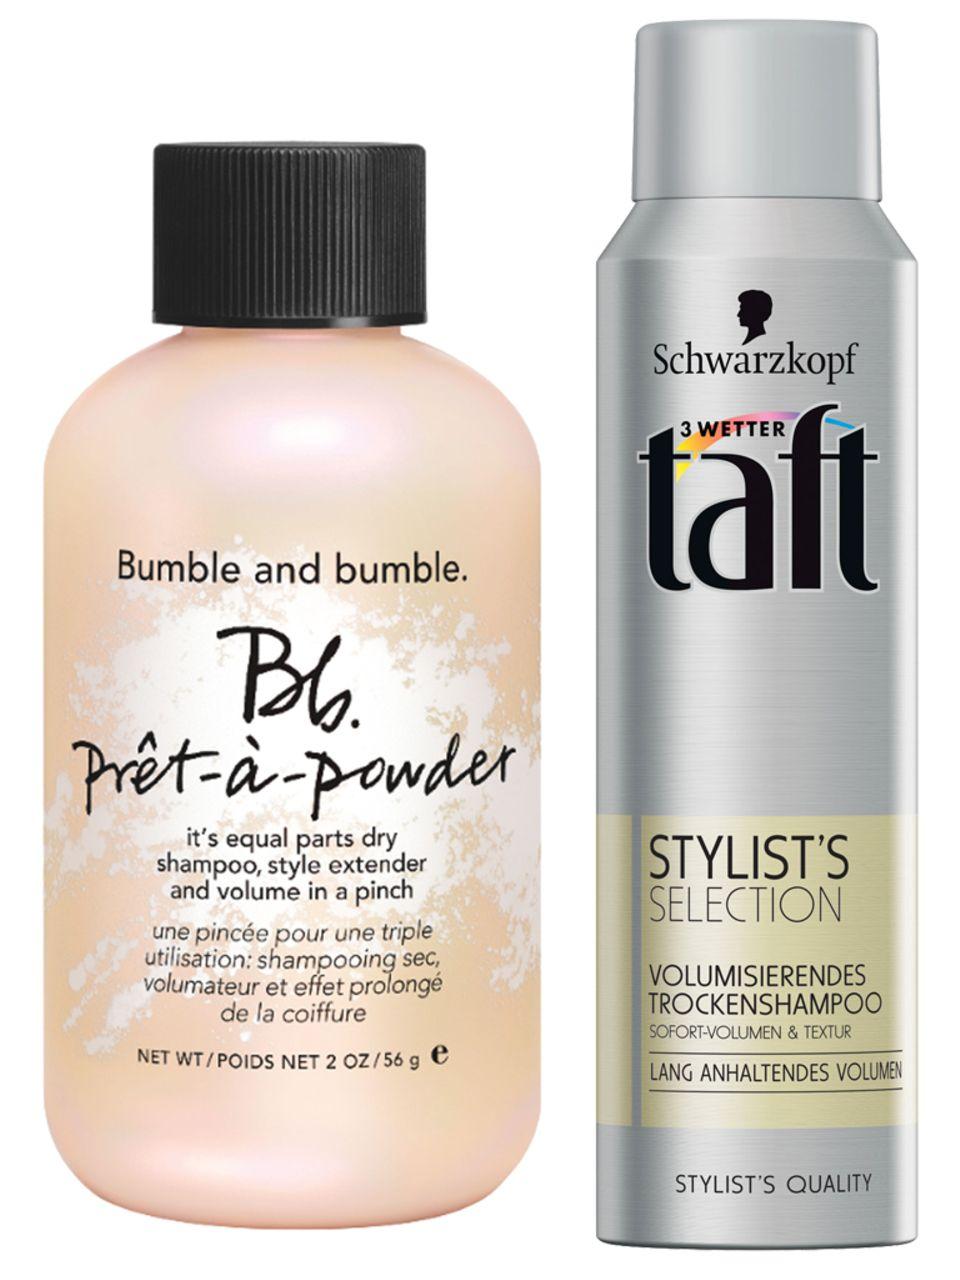 "Links: ""Bumble and Bumble Prêt-à-Powder"", 56 g, ca. 30 Euro; Rechts: ""Stylist's Selection volumisierendes Trockenshampoo"" von Taft, 150 ml, ca. 3 Euro."